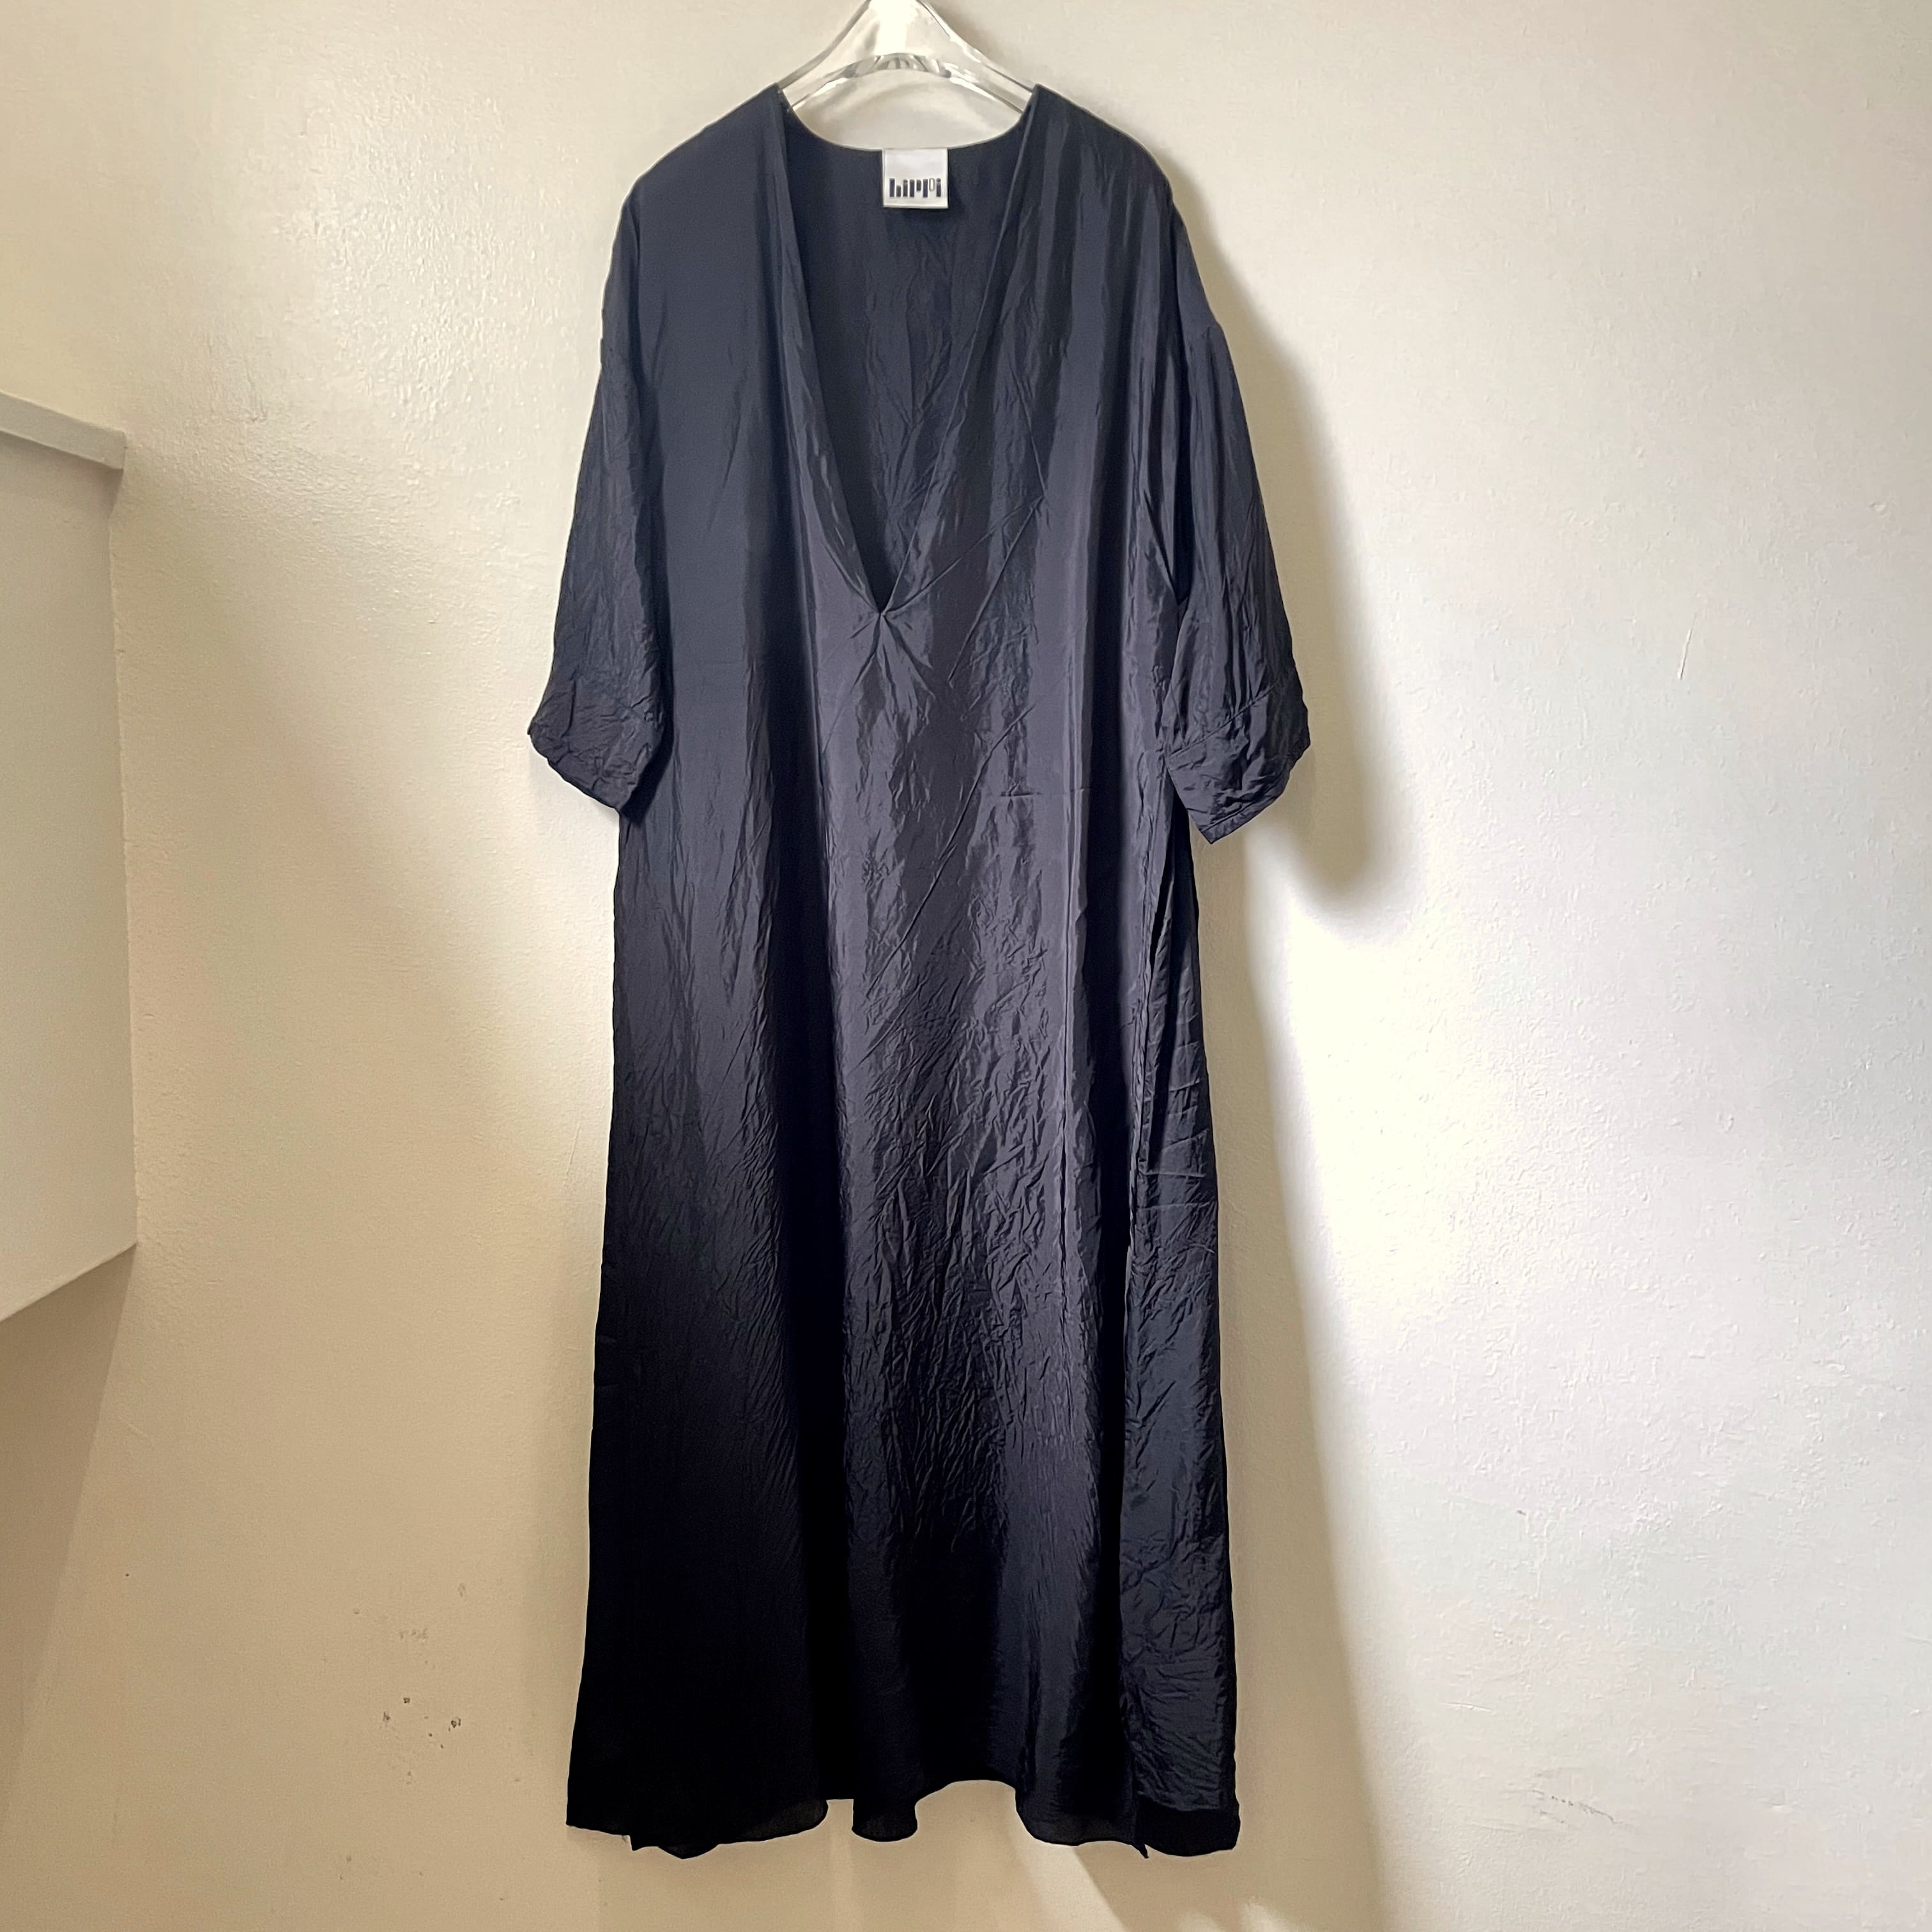 【hippiness × Sakurako.】cupro folkdress(black bamboo)/ 【ヒッピネス × サクラコ.】キュプラ フォークドレス(黒竹)